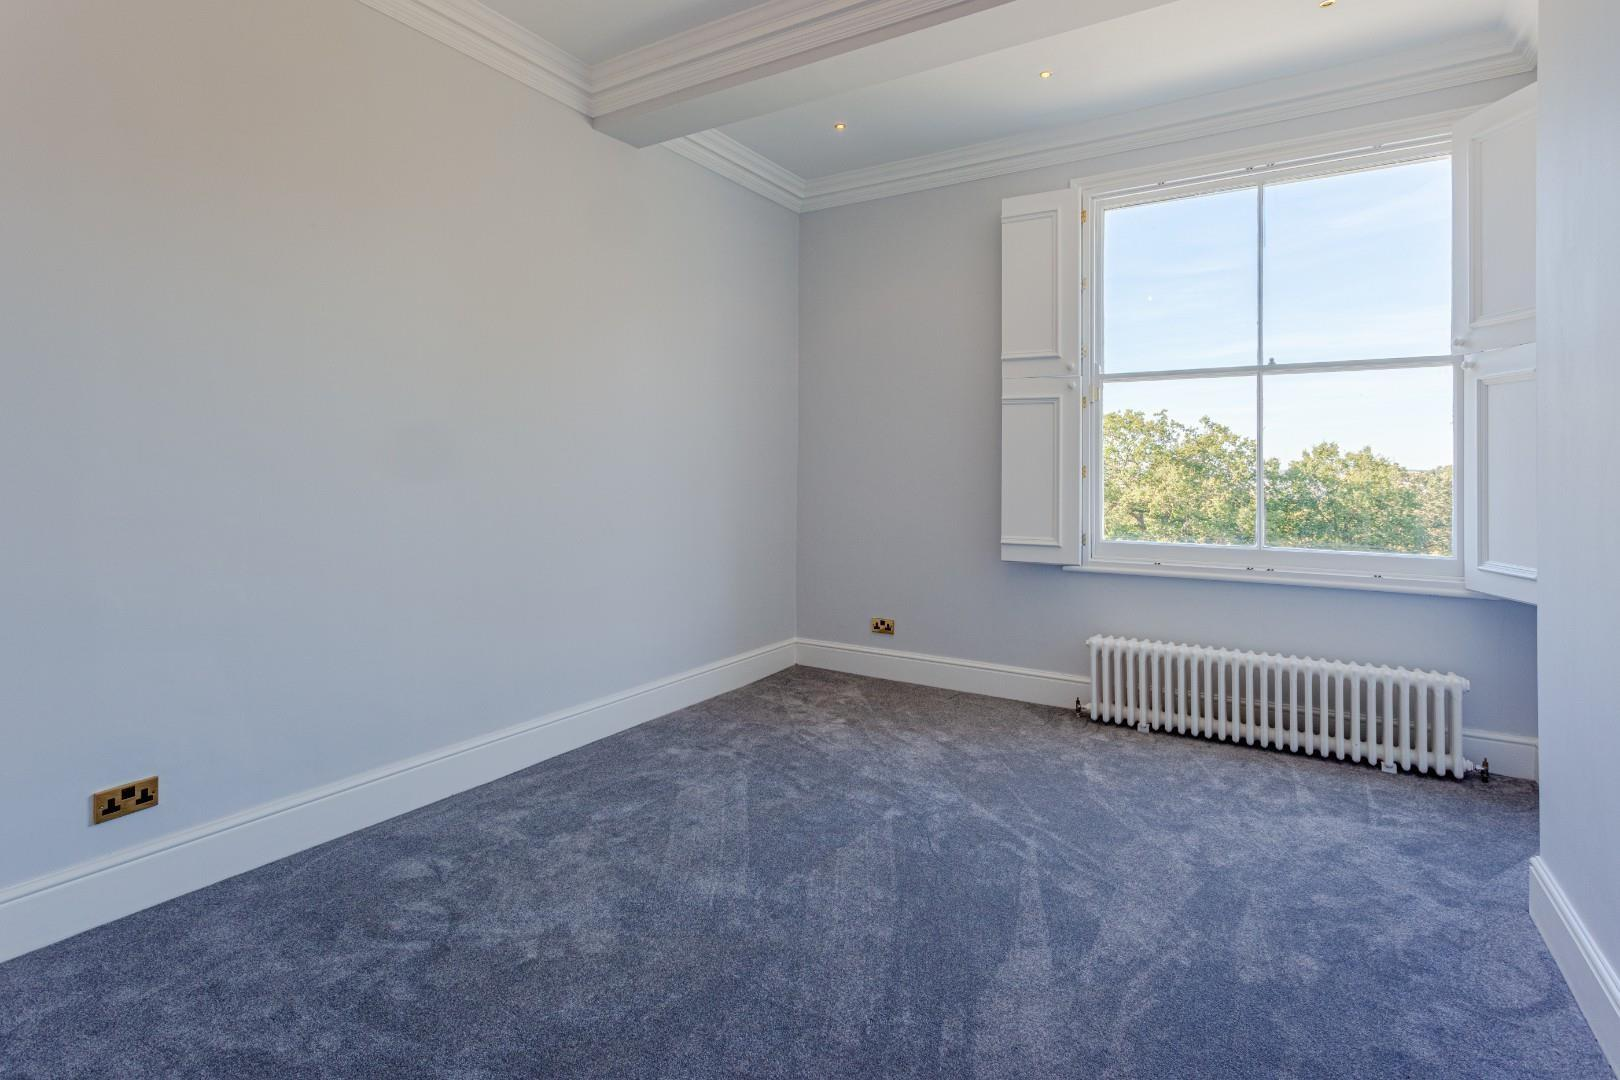 Bedroom iii (1 of 1).jpg